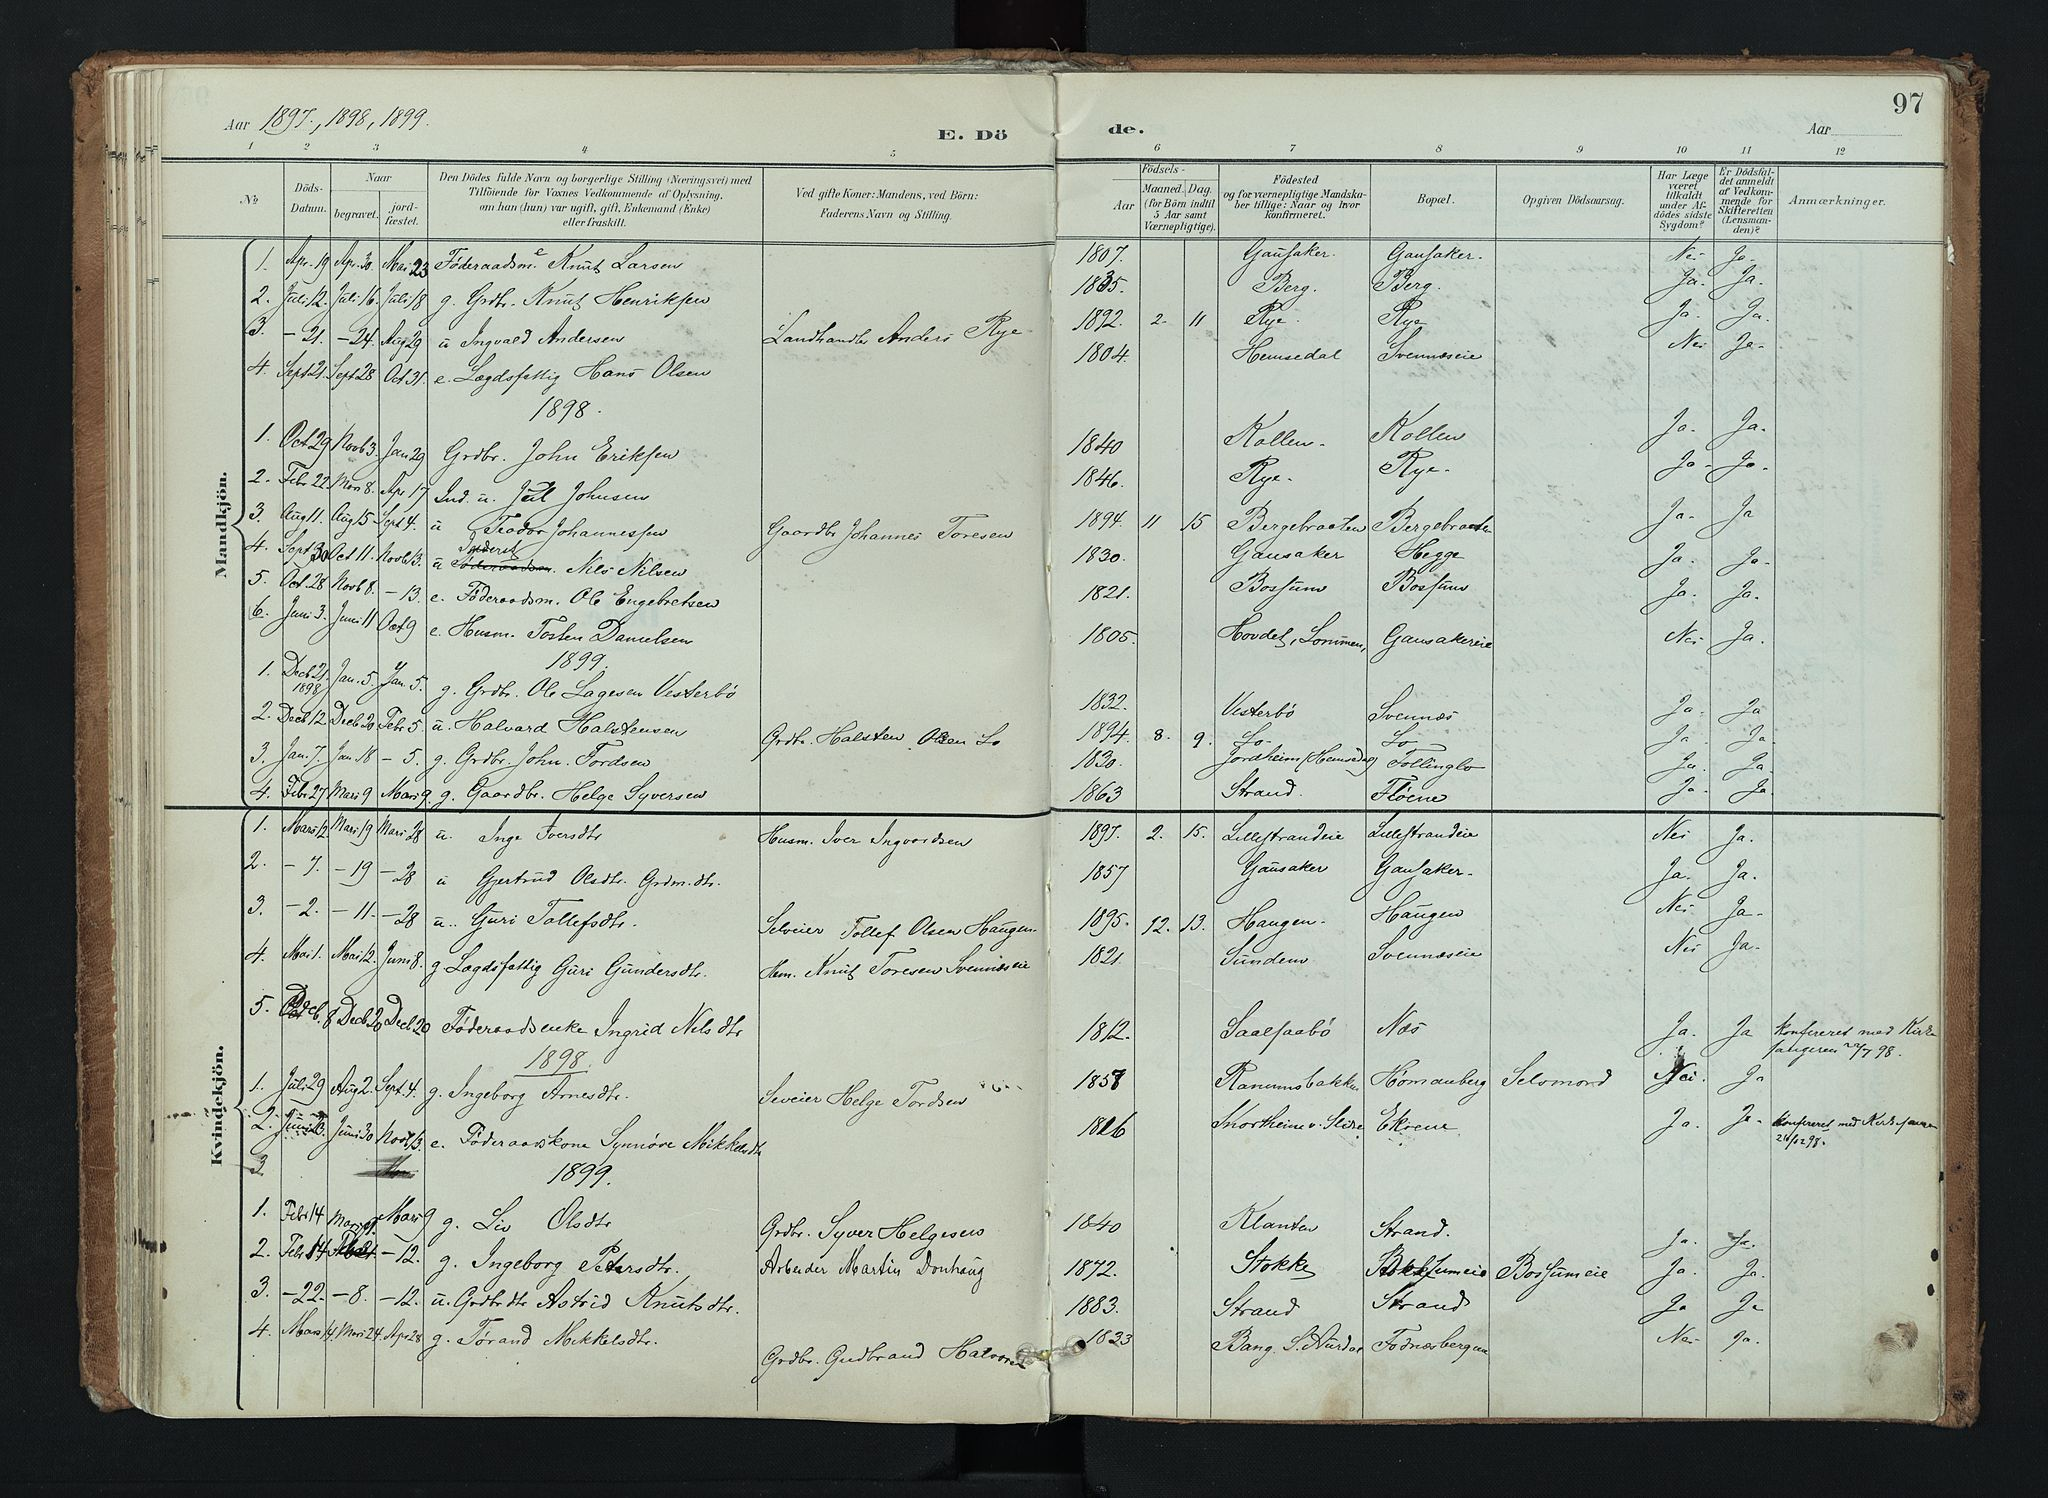 SAH, Nord-Aurdal prestekontor, Ministerialbok nr. 16, 1897-1925, s. 97